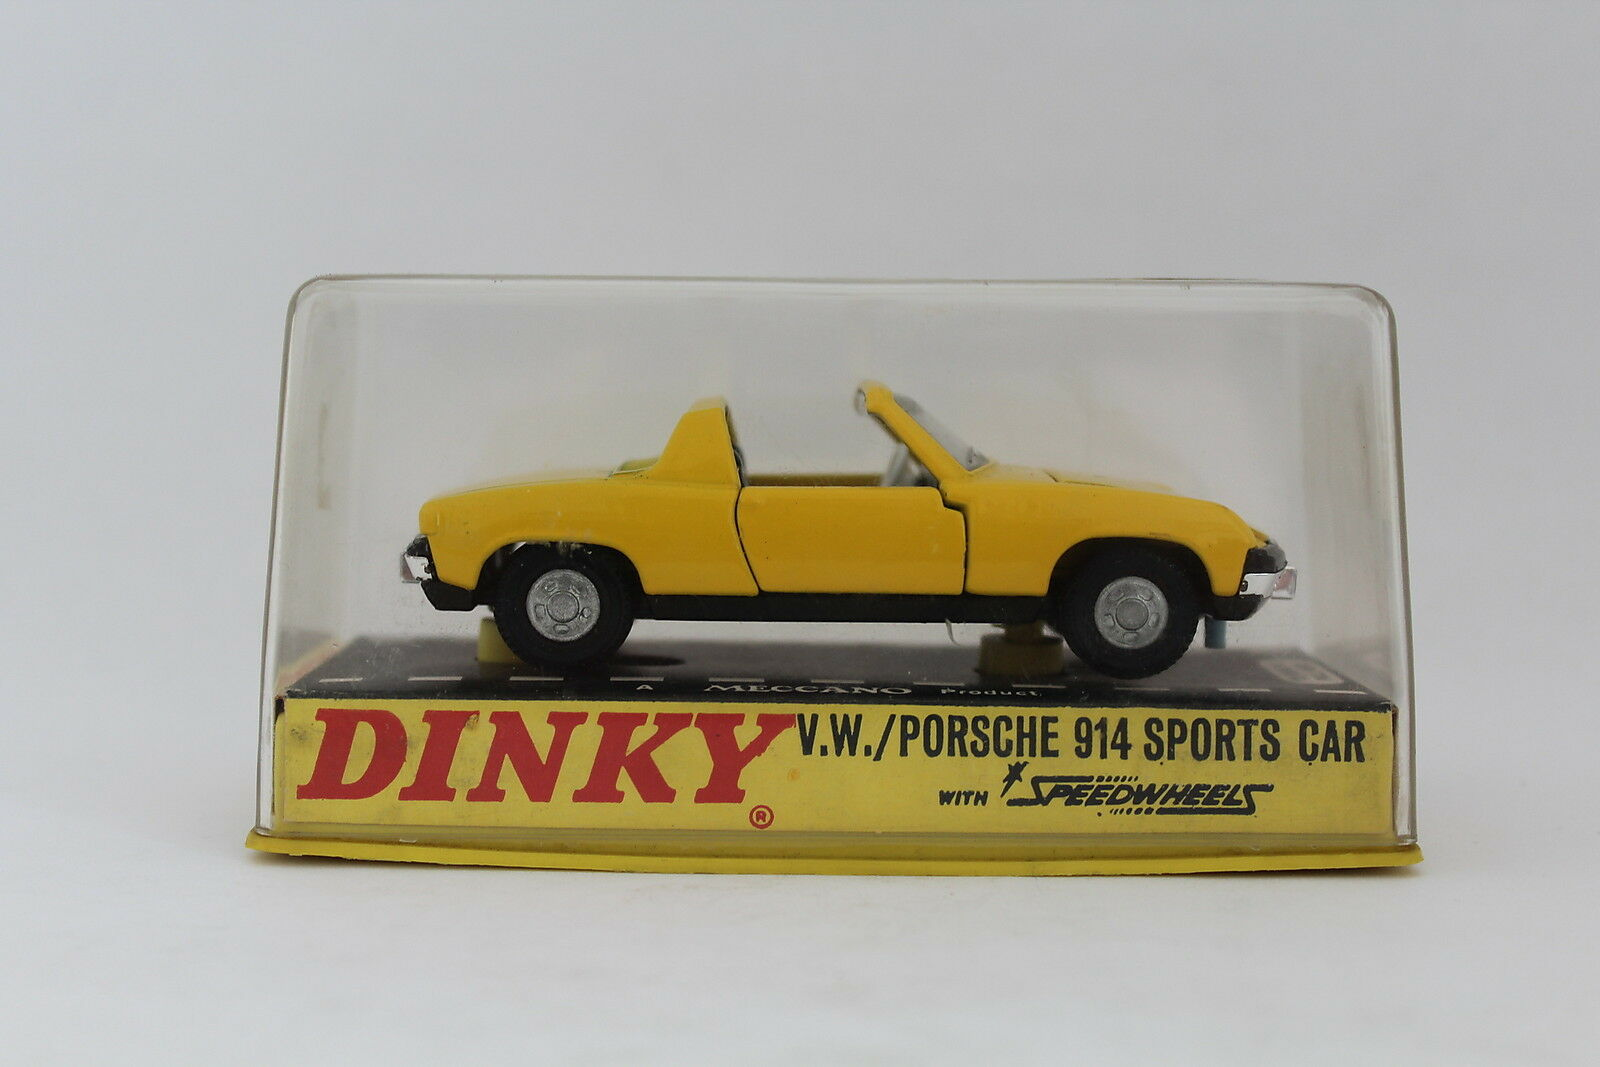 DINKY TOYS 208 V.W. V.W. V.W. VOLKSWAGEN PORSCHE 914 SPORTS CAR MECCANO NIB [OR3-14] be665e